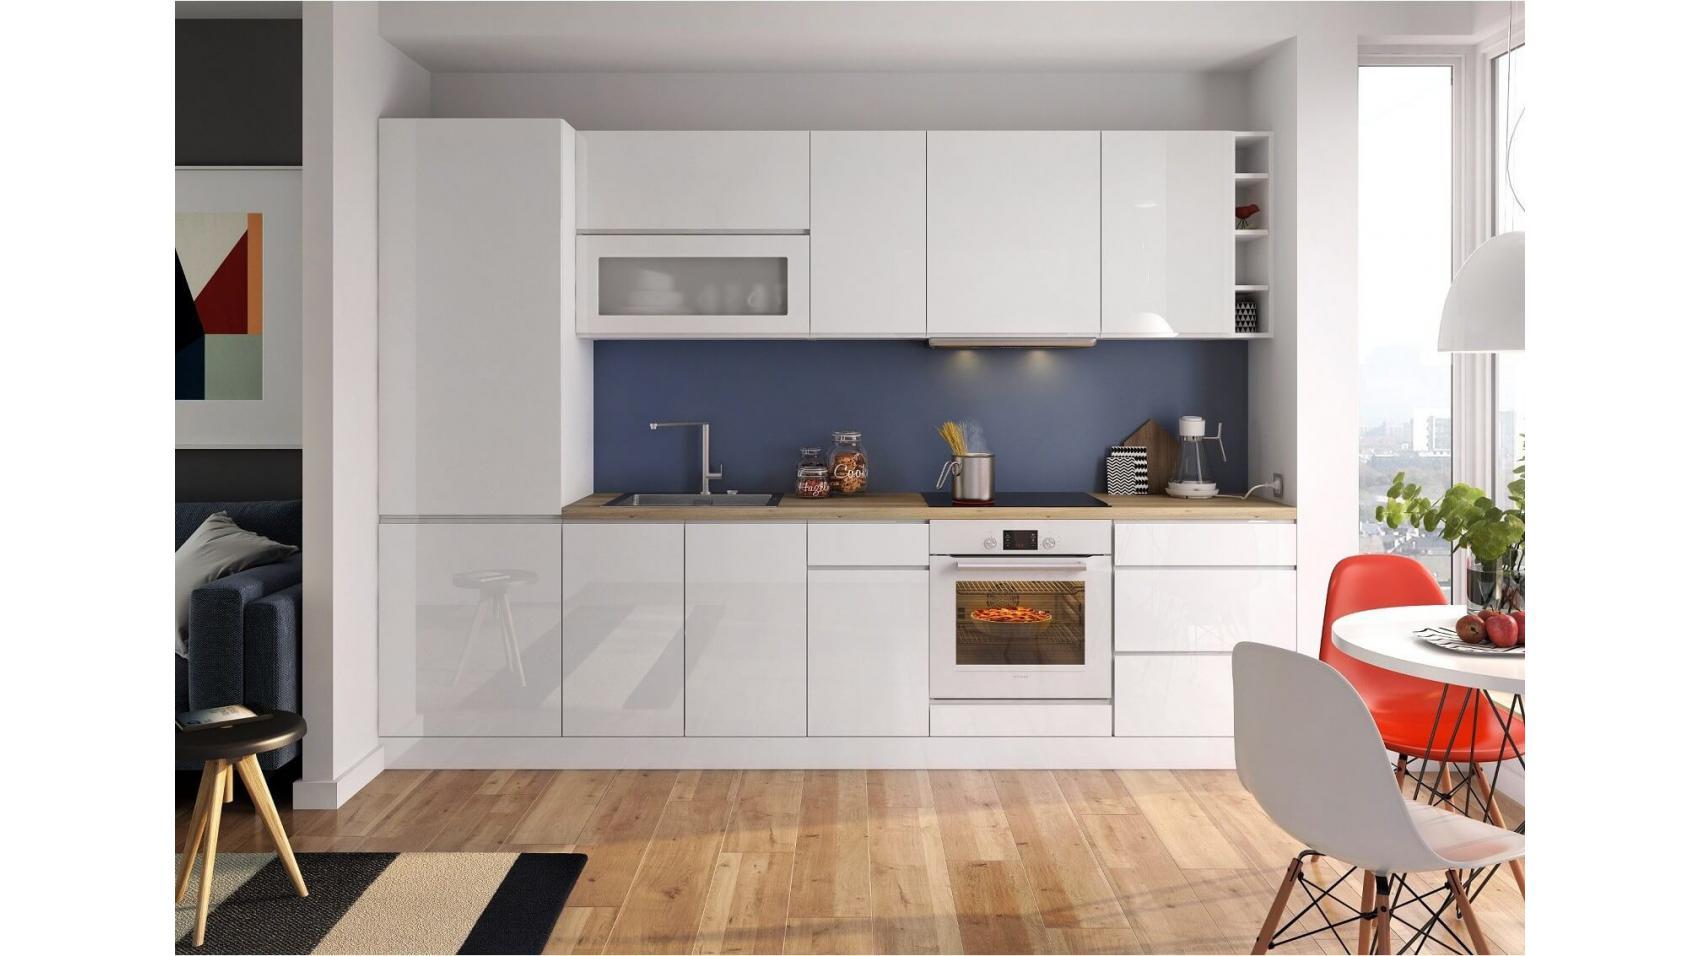 Vegas White - minimalistyczne i nowoczesne meble kuchenne